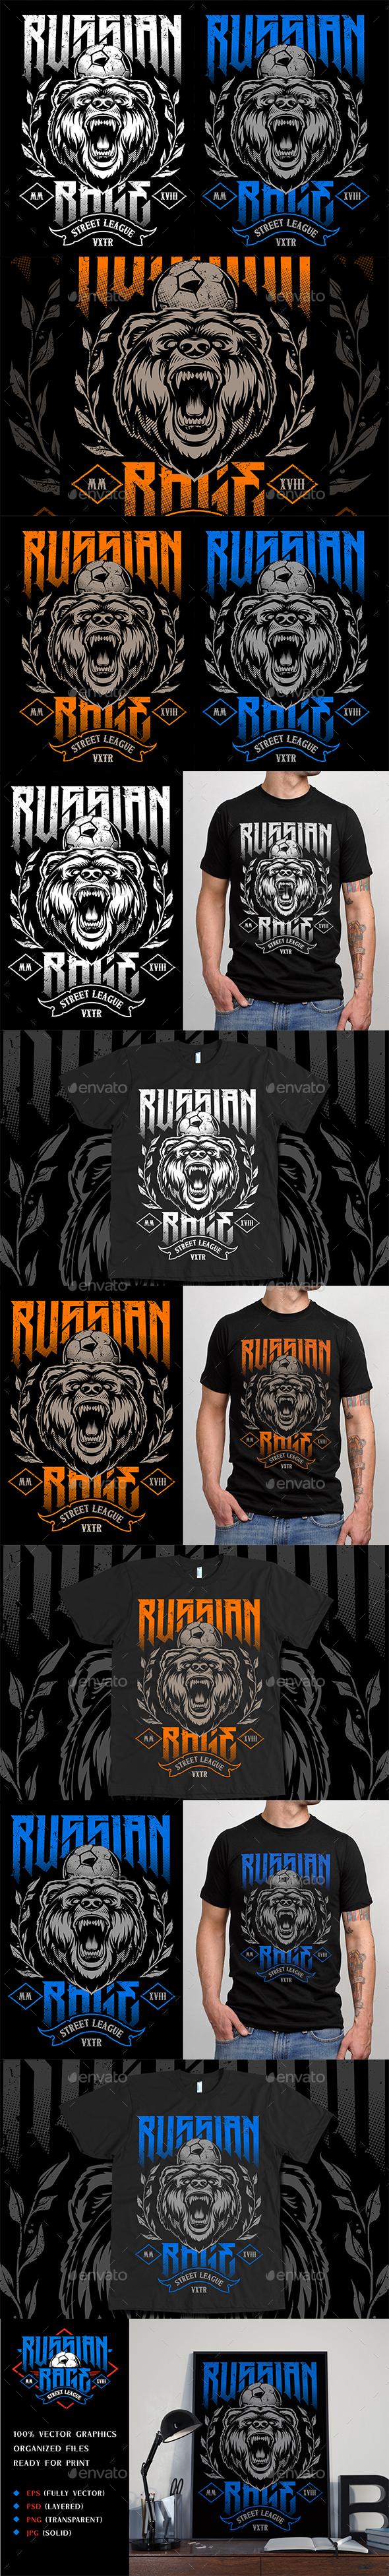 Russian Rage Vector Print - Sports/Activity Conceptual